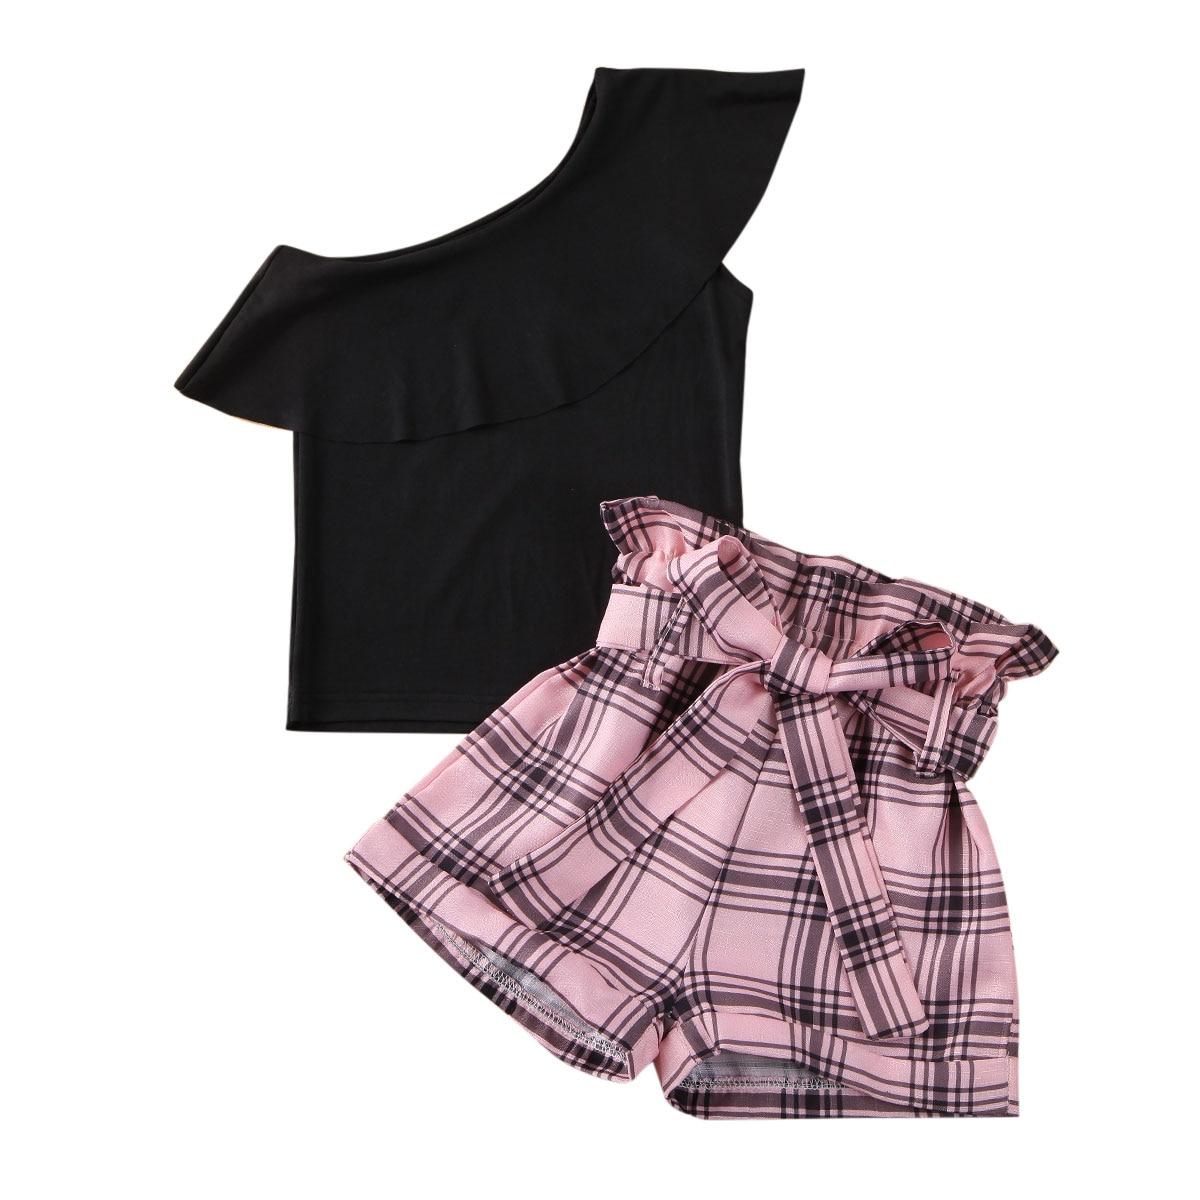 2-7Y Toddler Baby Girls Clothes Sets One Shoulder Ruffles T Shirts Tops Plaid Print Bow Shorts 2pcs